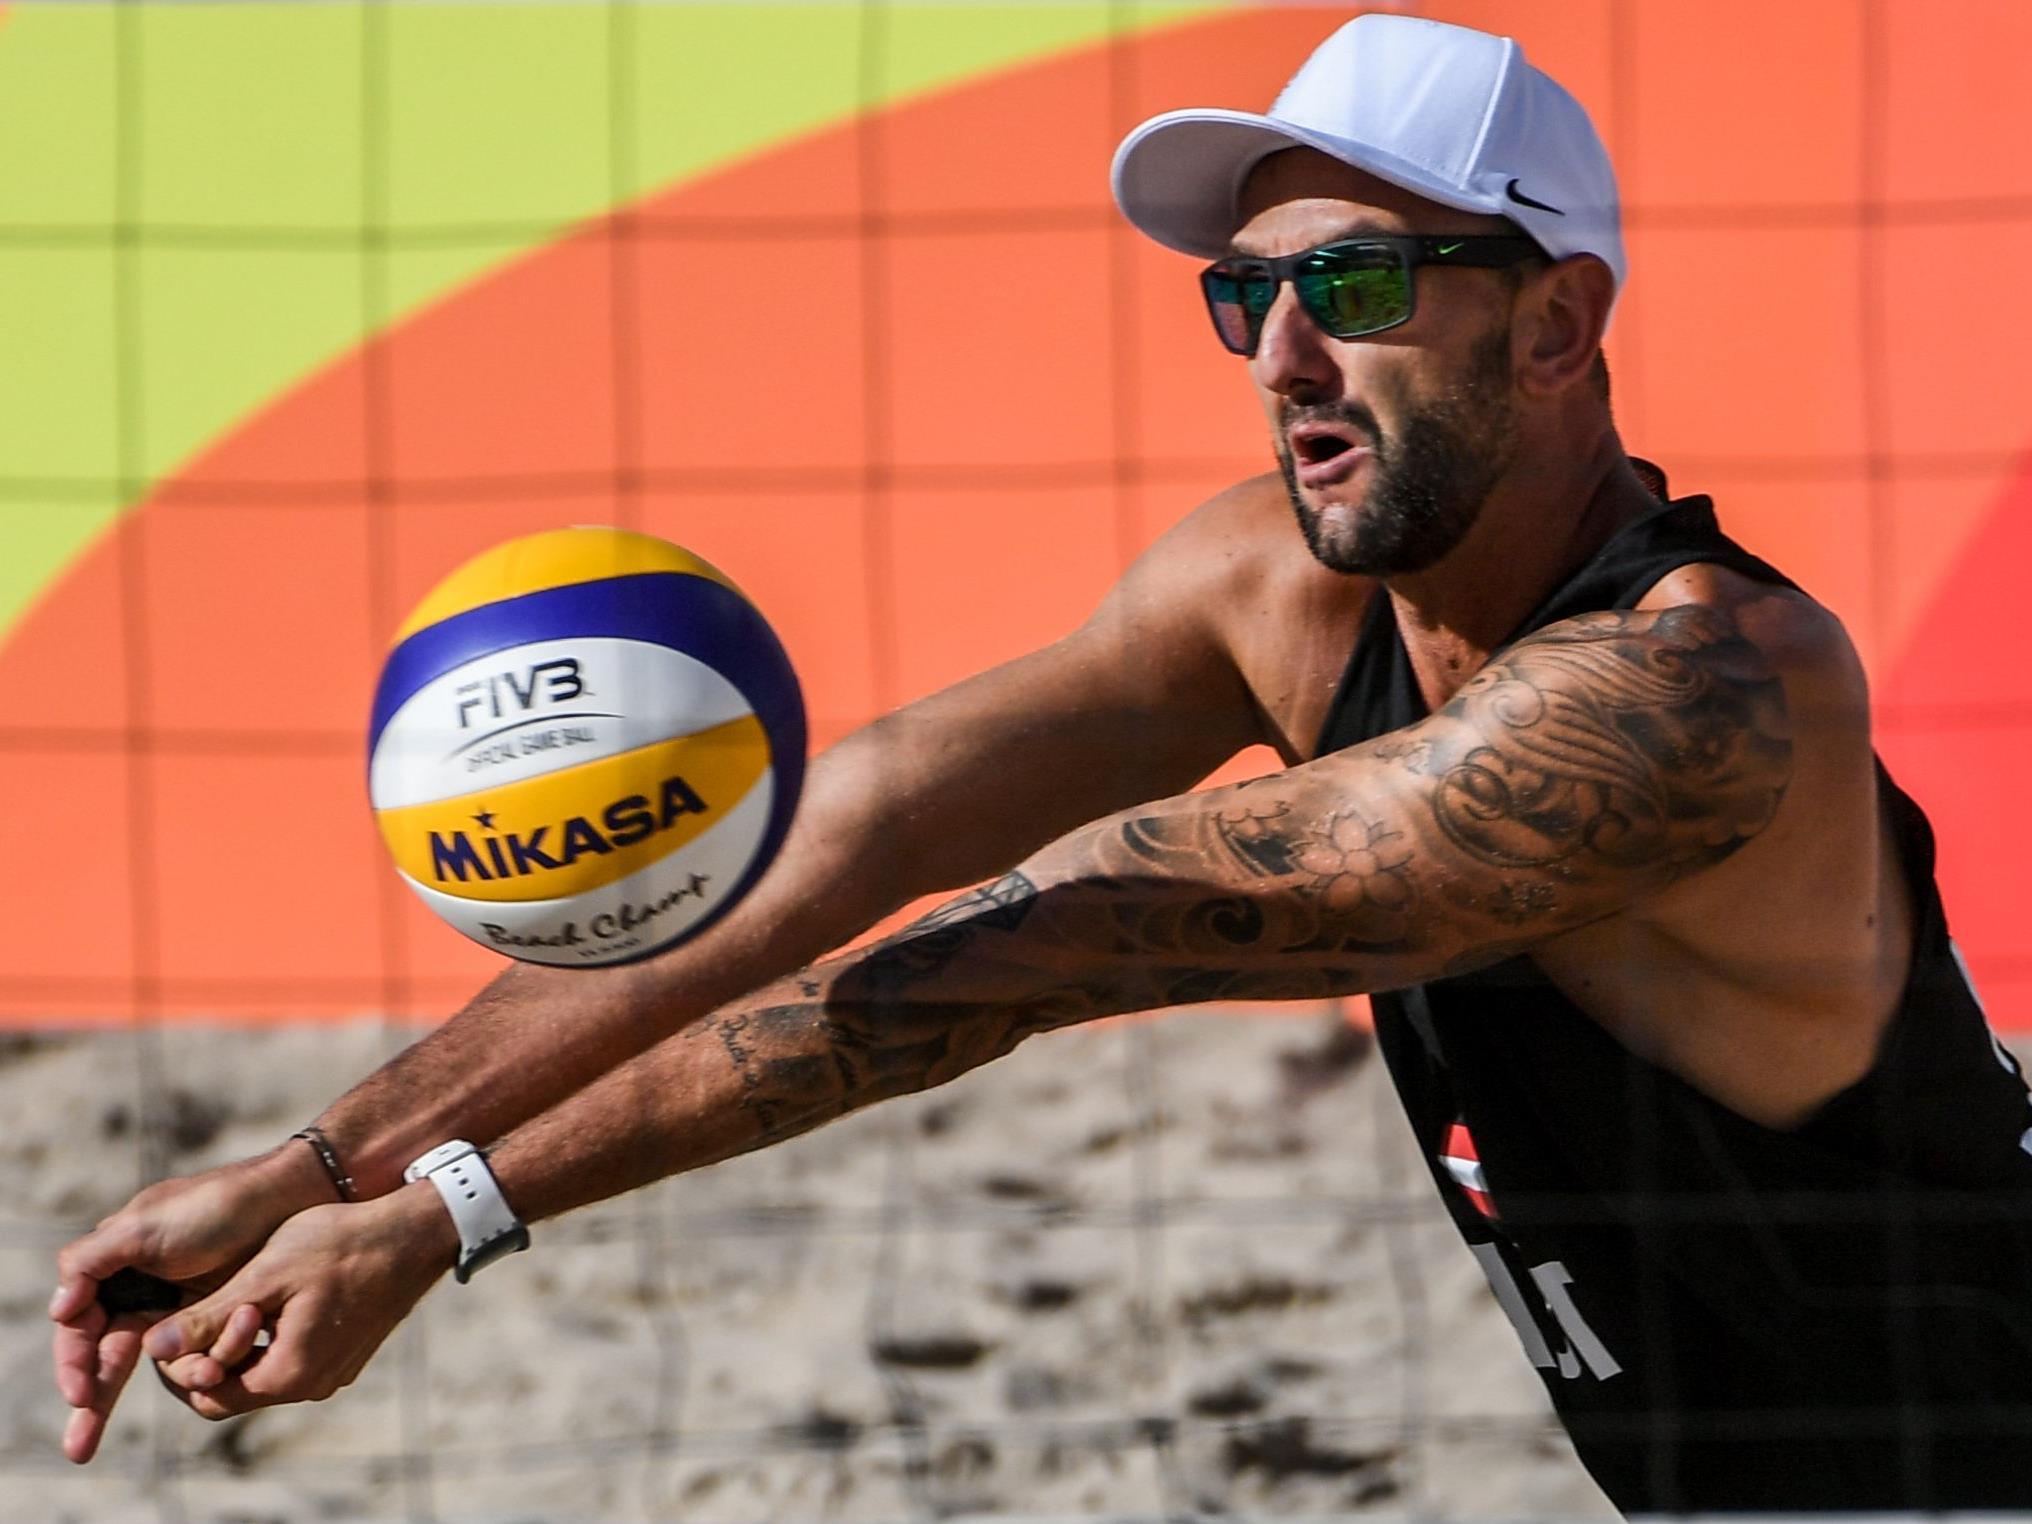 Clemens Doppler in Rio in Action.